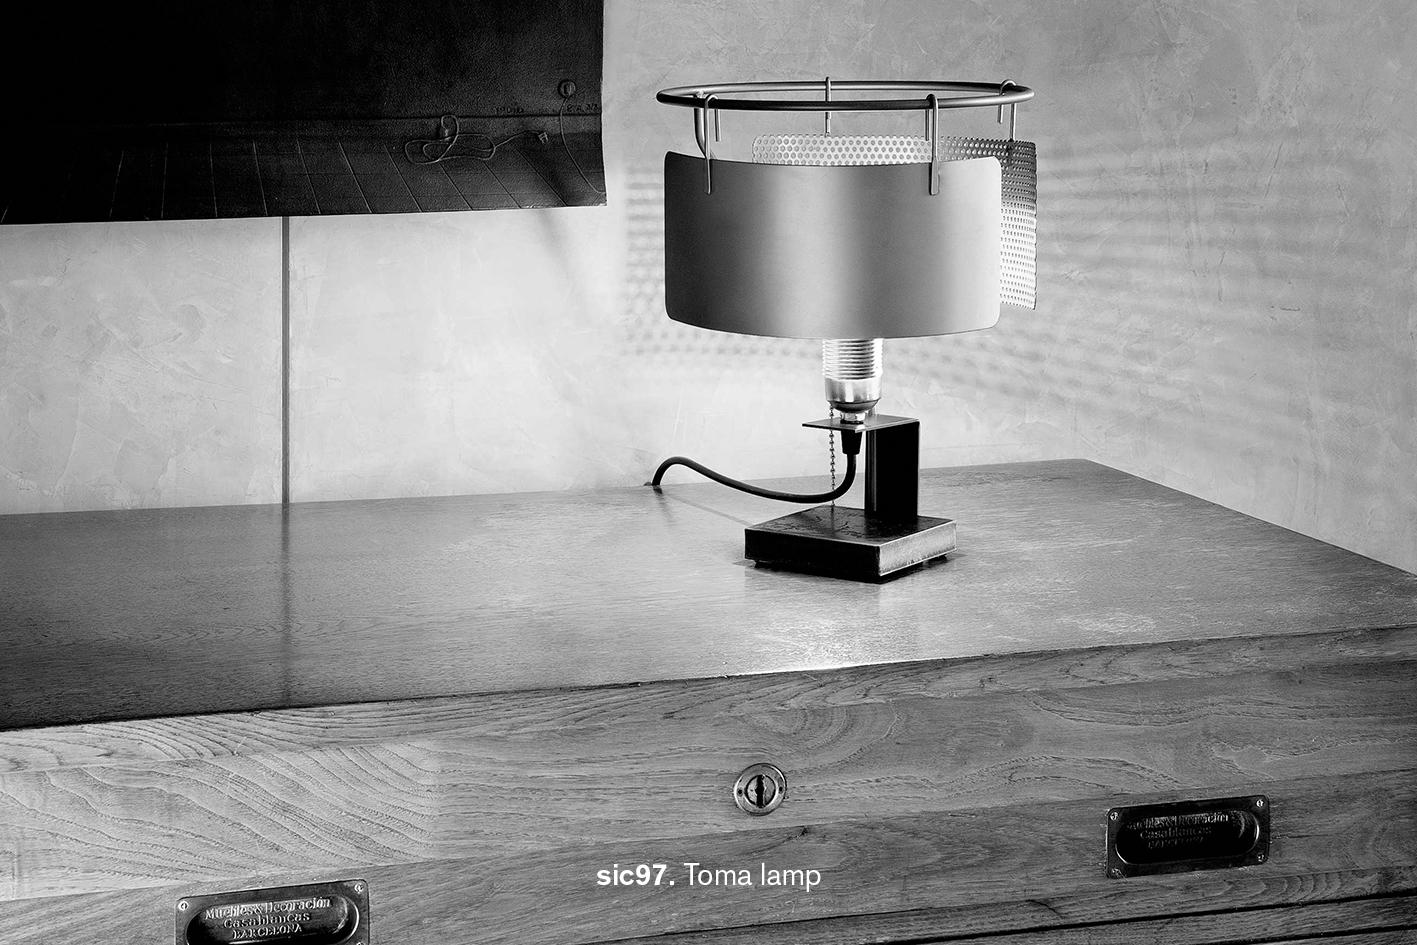 desigmed_sic97_Toma lamp text.jpg